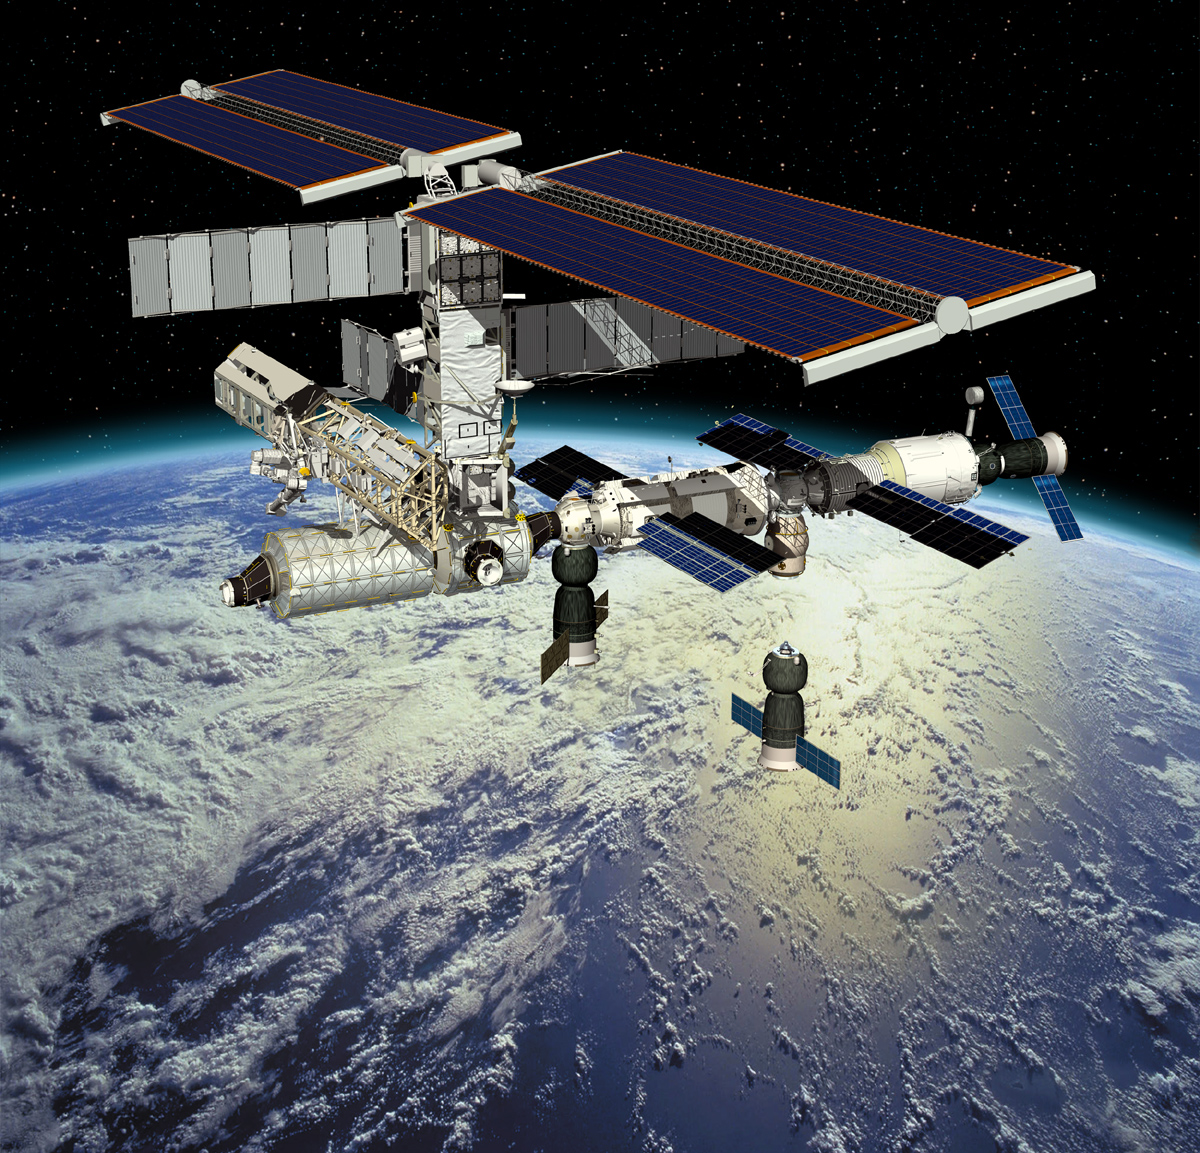 https://i2.wp.com/esamultimedia.esa.int/images/ISS/ISS_S5flight.jpg